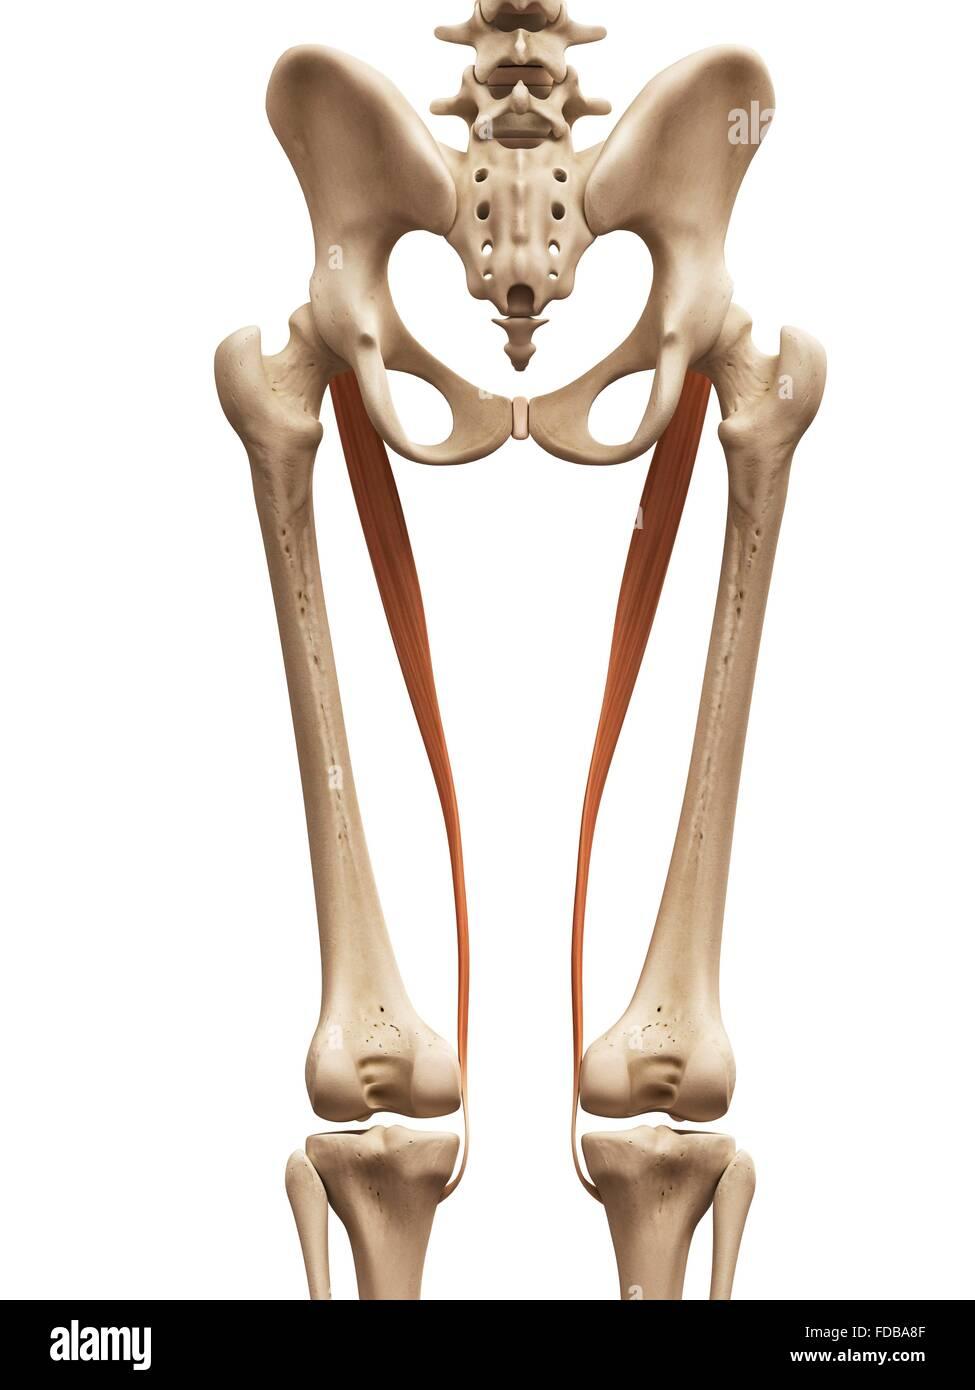 Atemberaubend Leiste Anatomie Muskeln Galerie - Anatomie Ideen ...